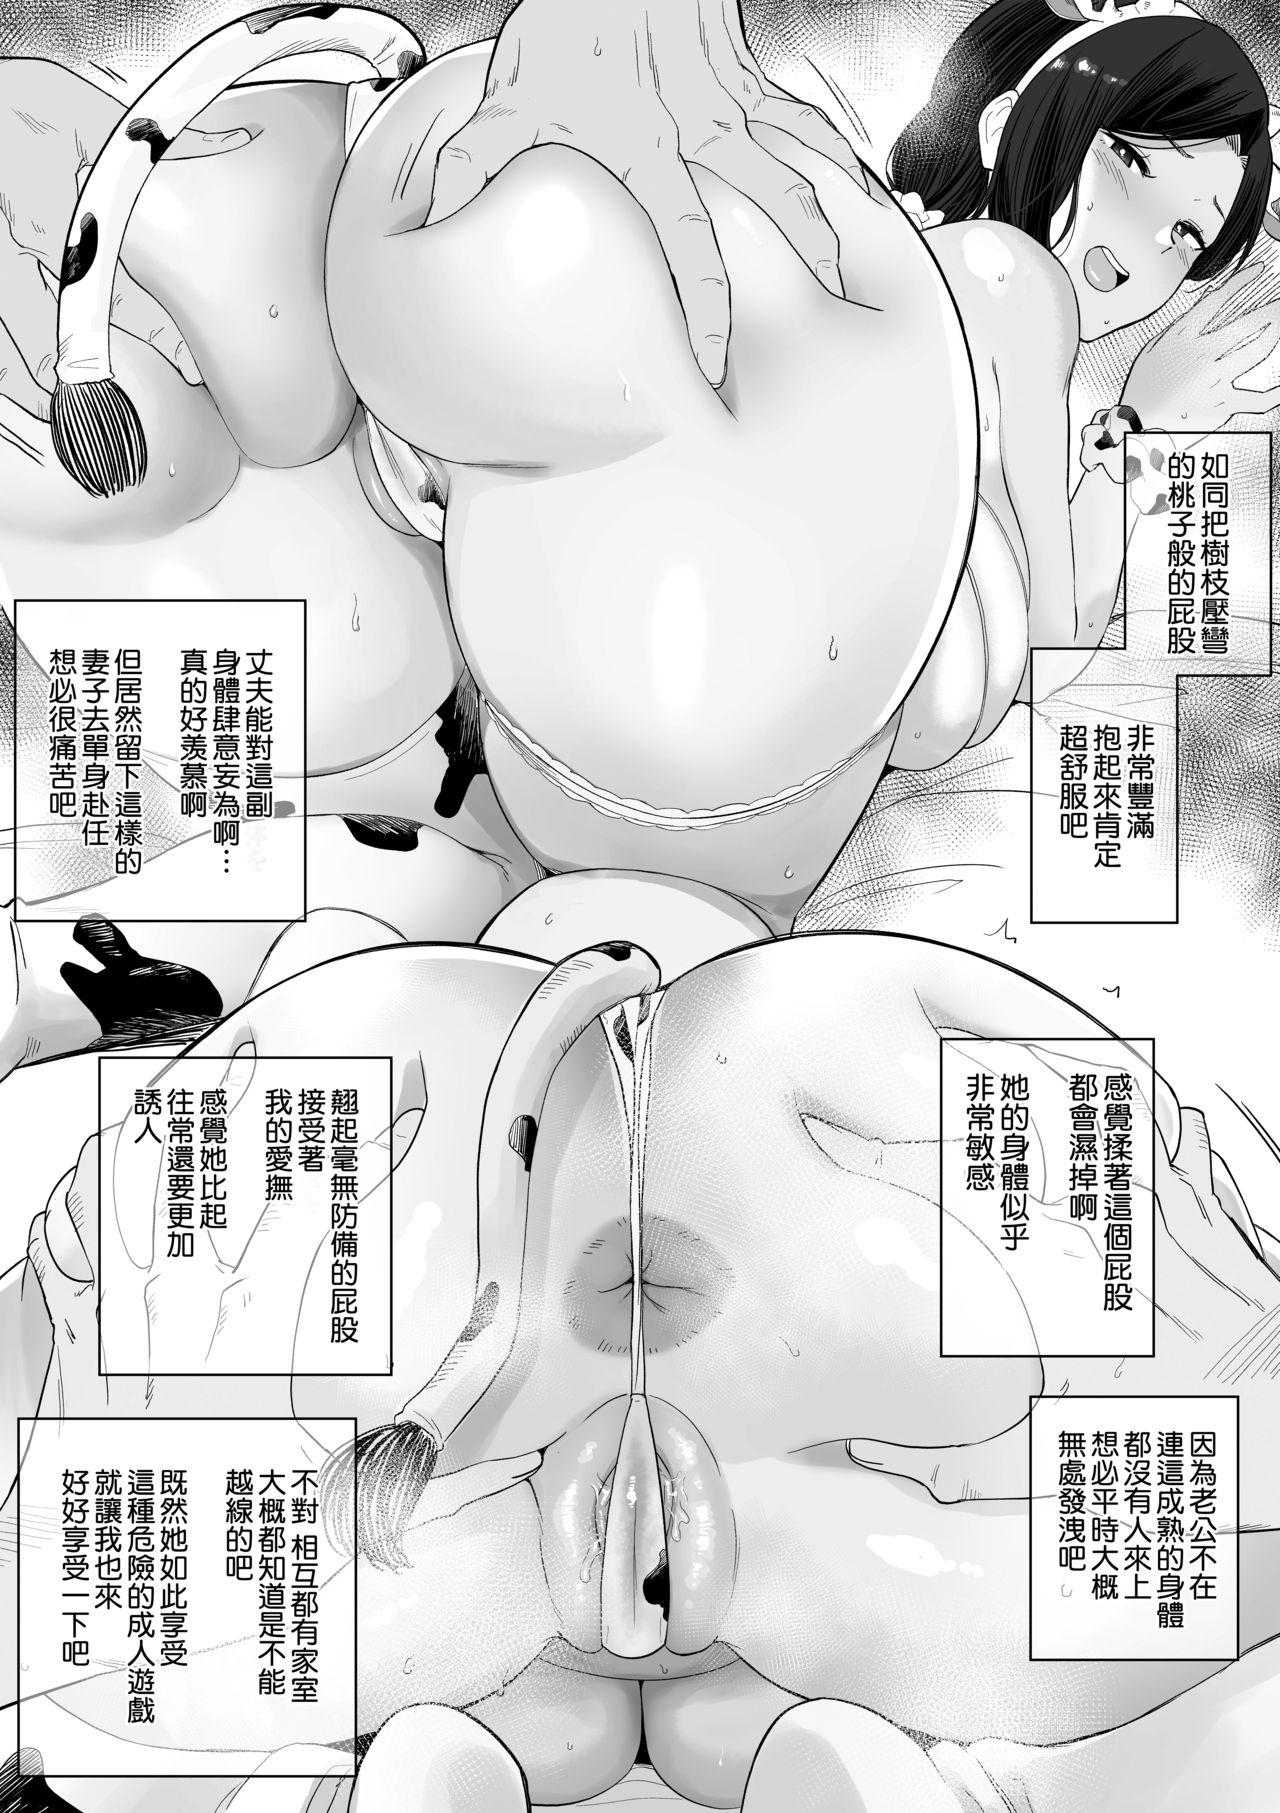 [Andoryu] Okaa-san Itadakimasu. Side Story 3 Ushi Manga Tanpenshuu Ch. 1-4 [Chinese] [空気系☆漢化] 4